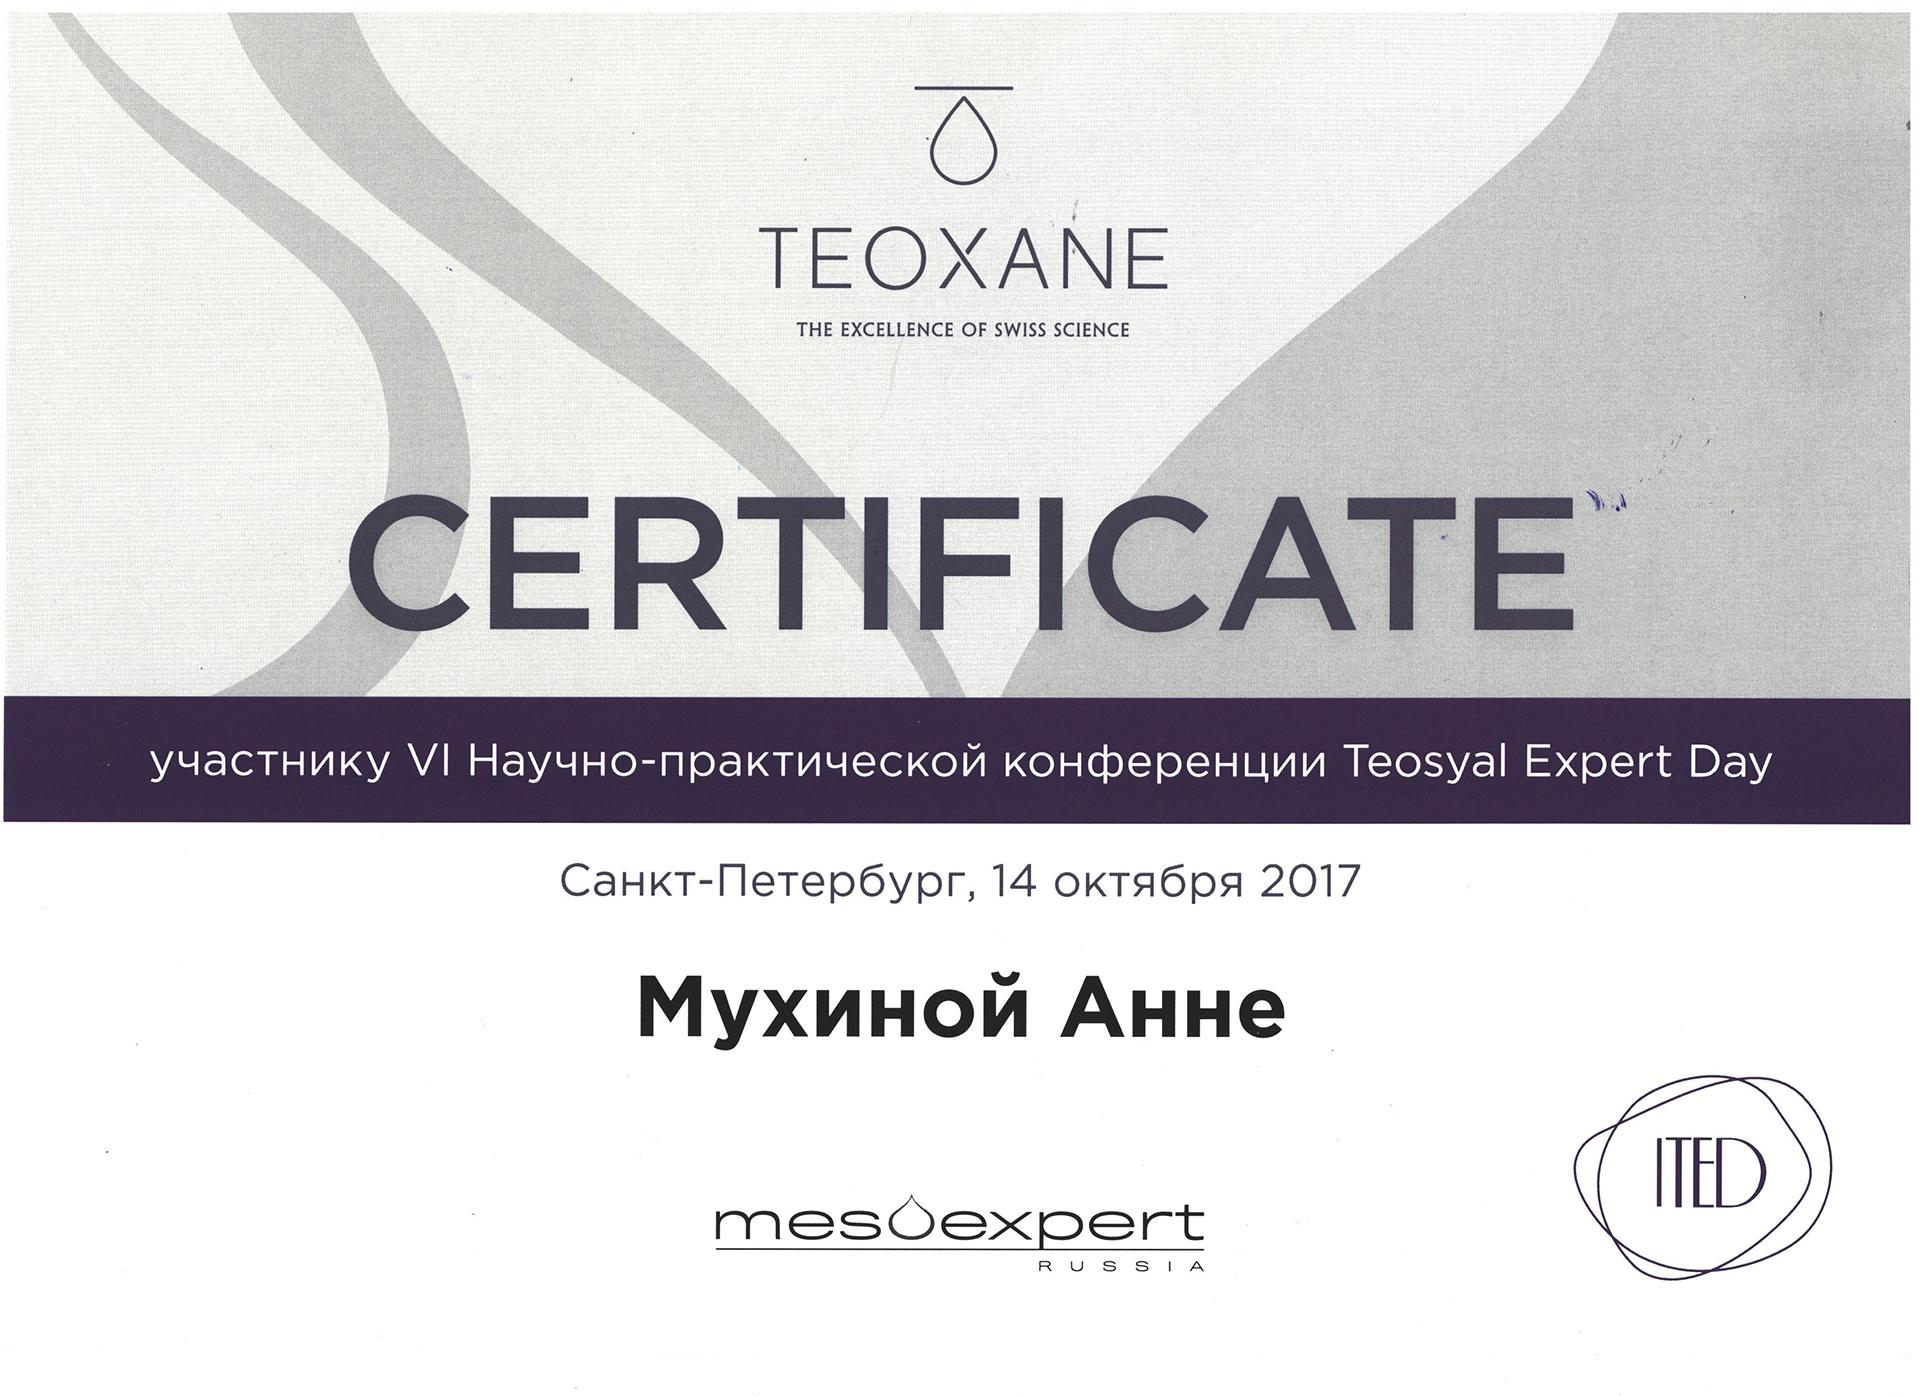 Сертификат — Конференция Teosyal Expert Day. Мухина Анна Михайловна